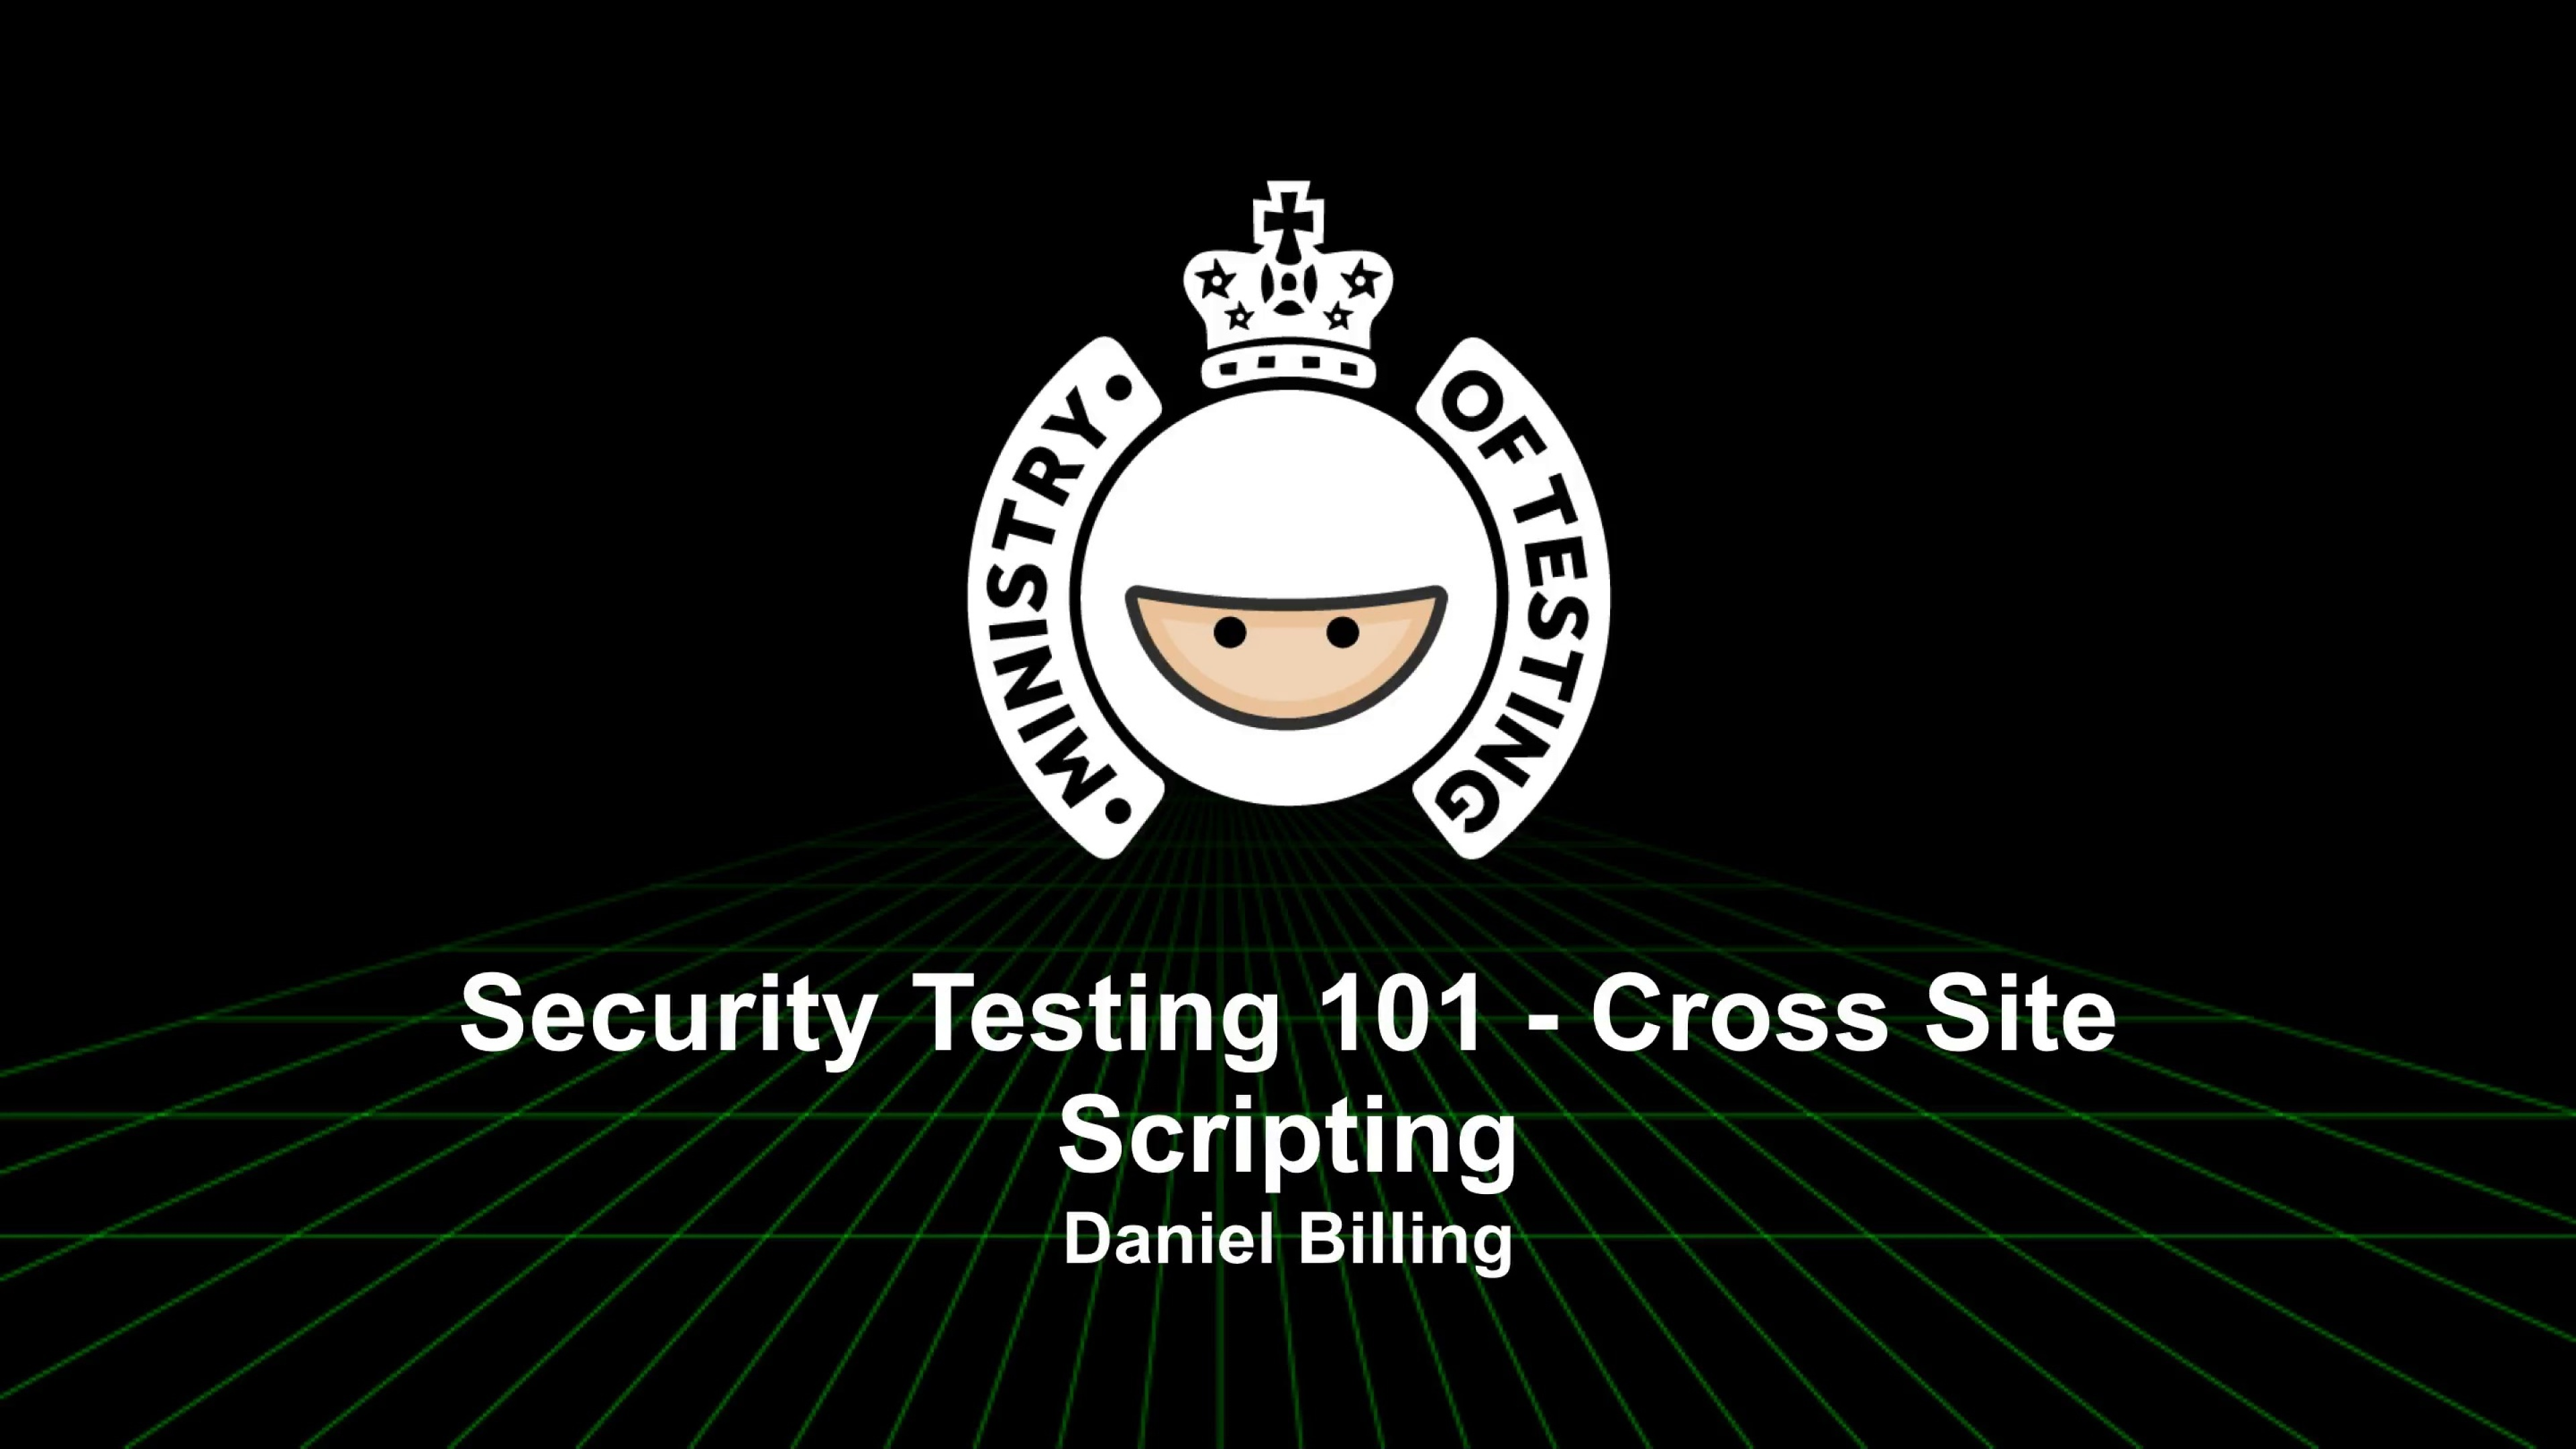 Security Testing 101 - Cross Site Scripting